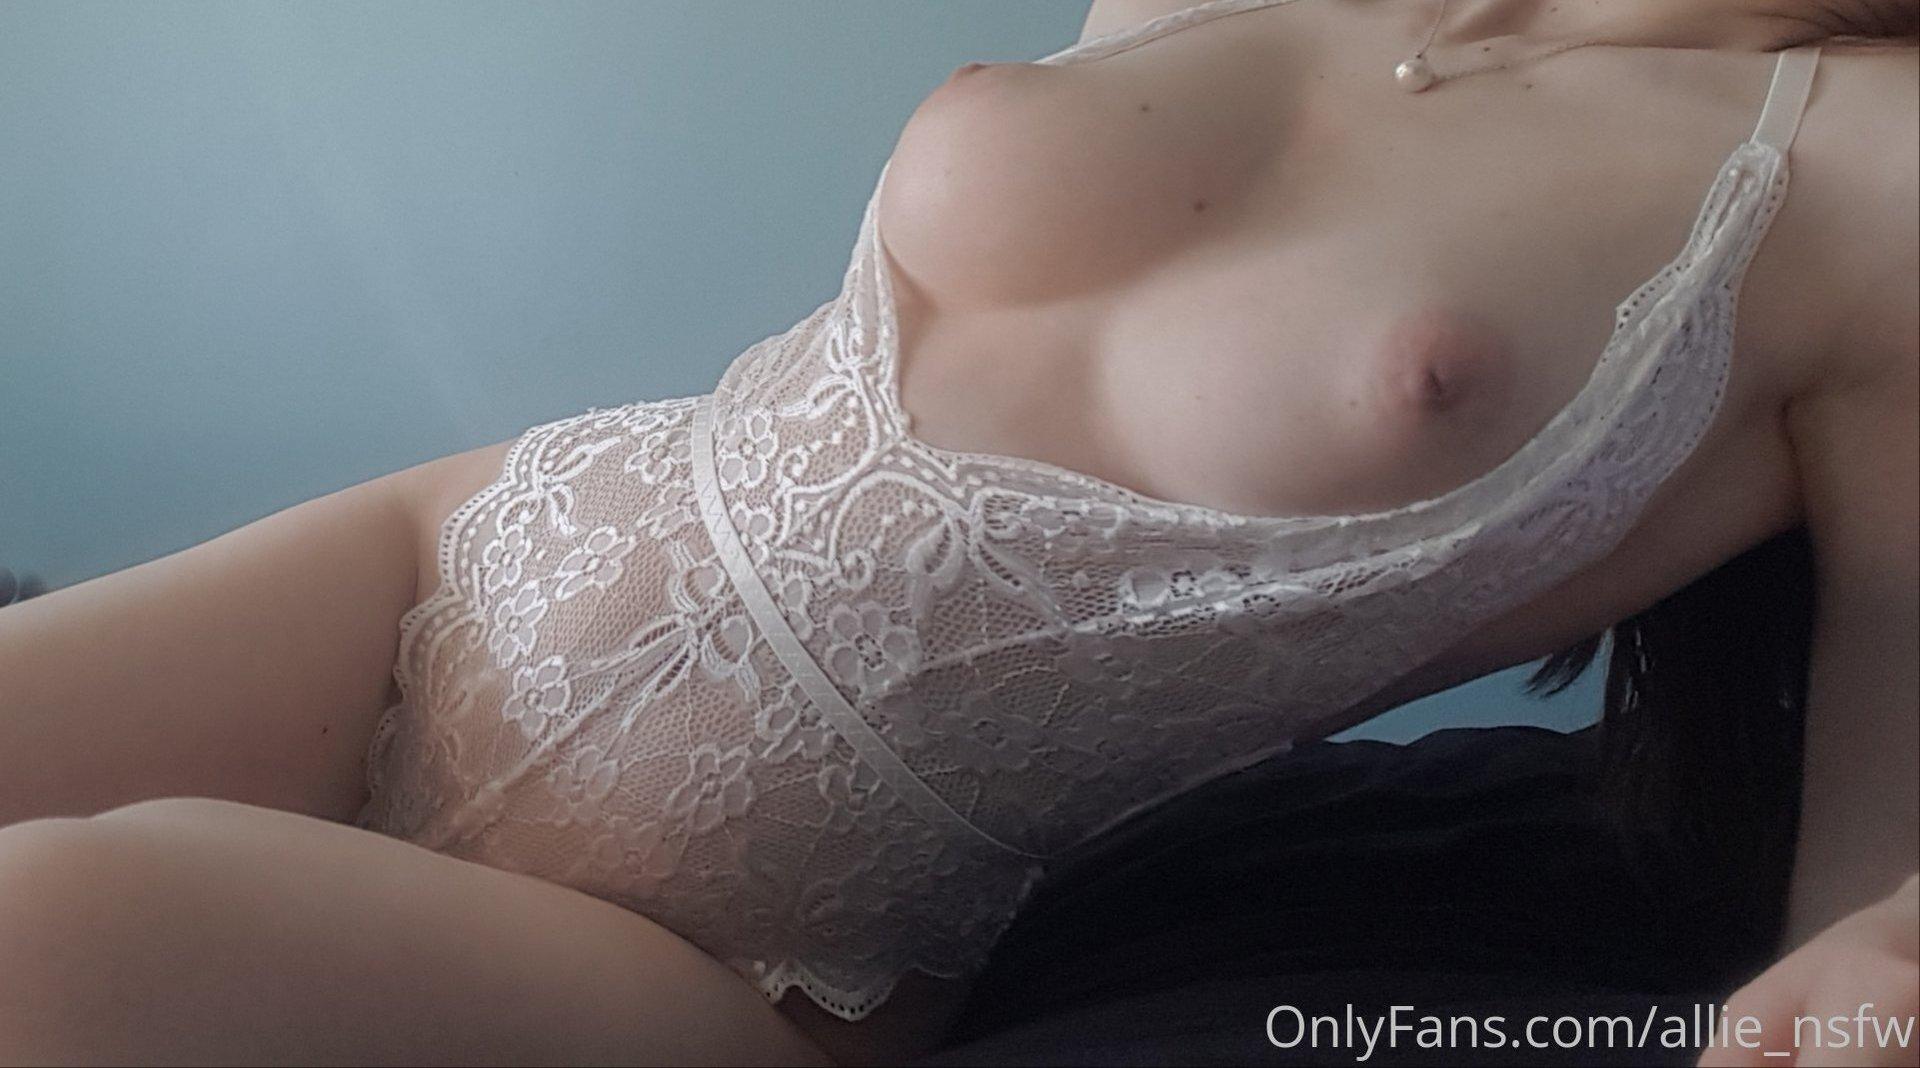 Allie Alliensfw Onlyfans Nude Leaks 0030